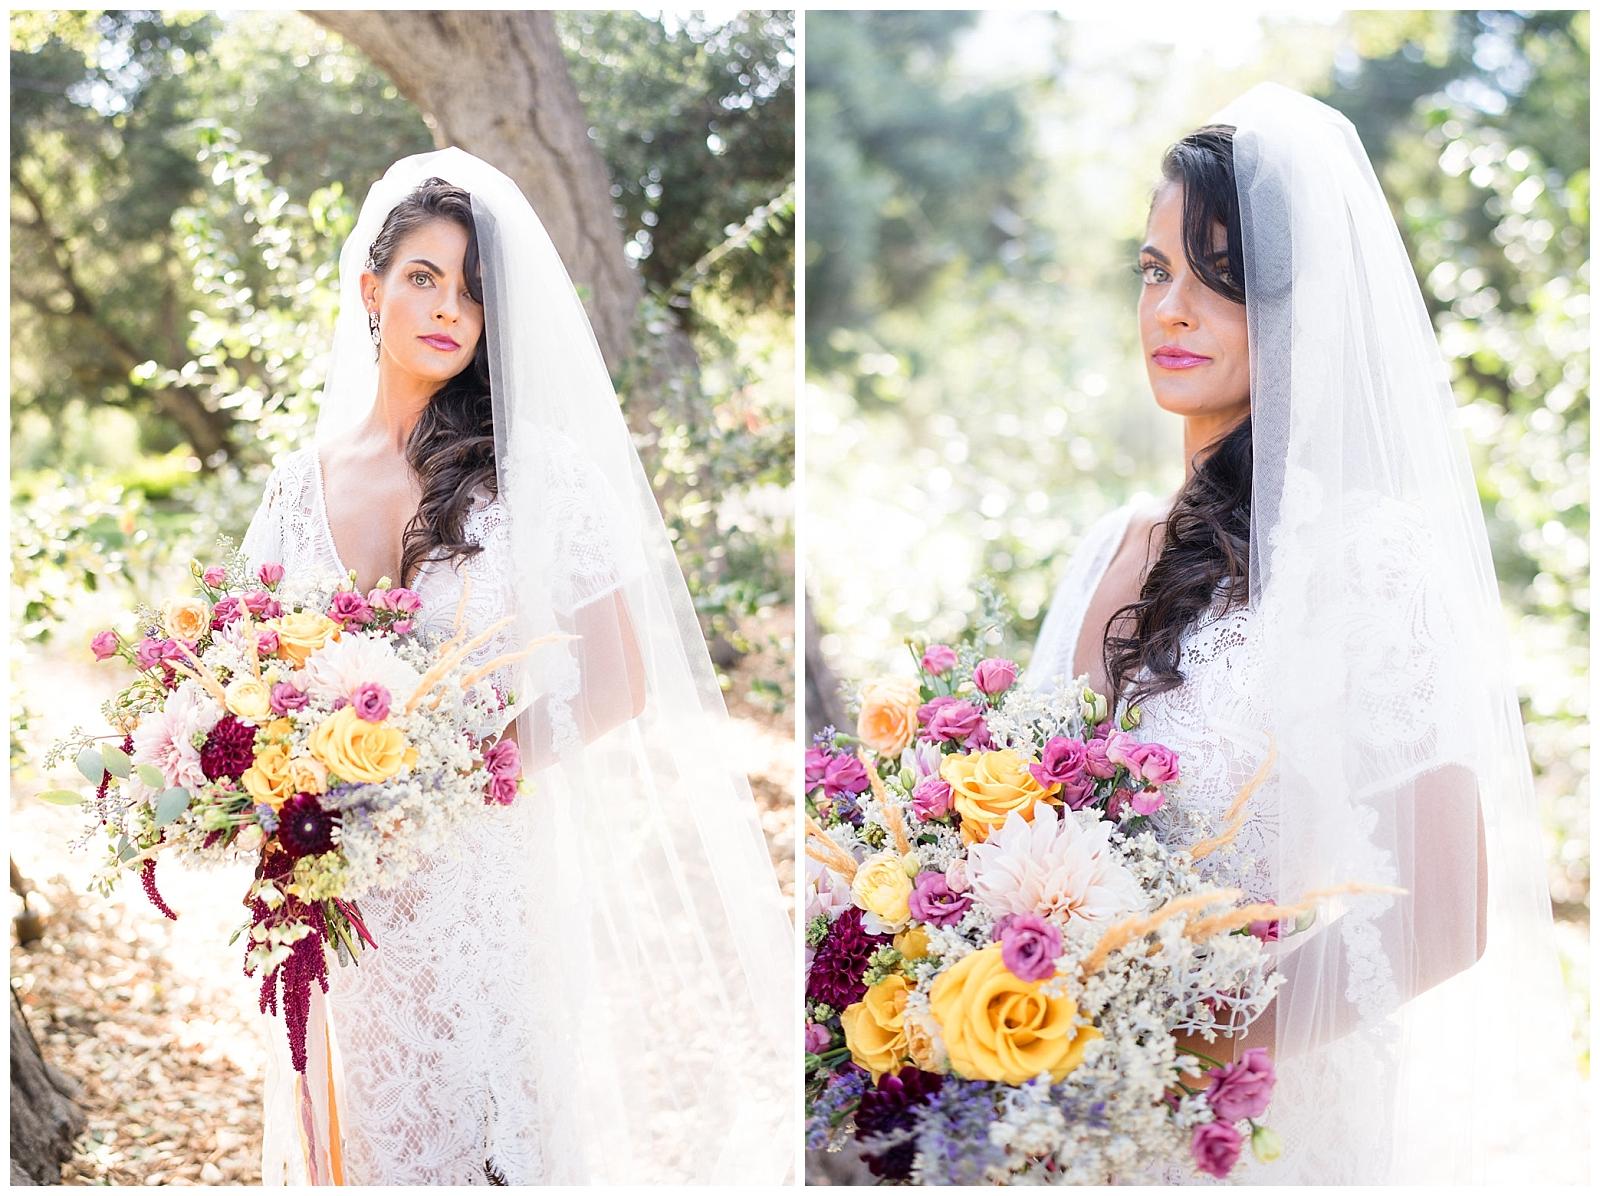 Veil-Inspiration-Epiphany-Wedding-Dress-De-Joy-Photography.jpg